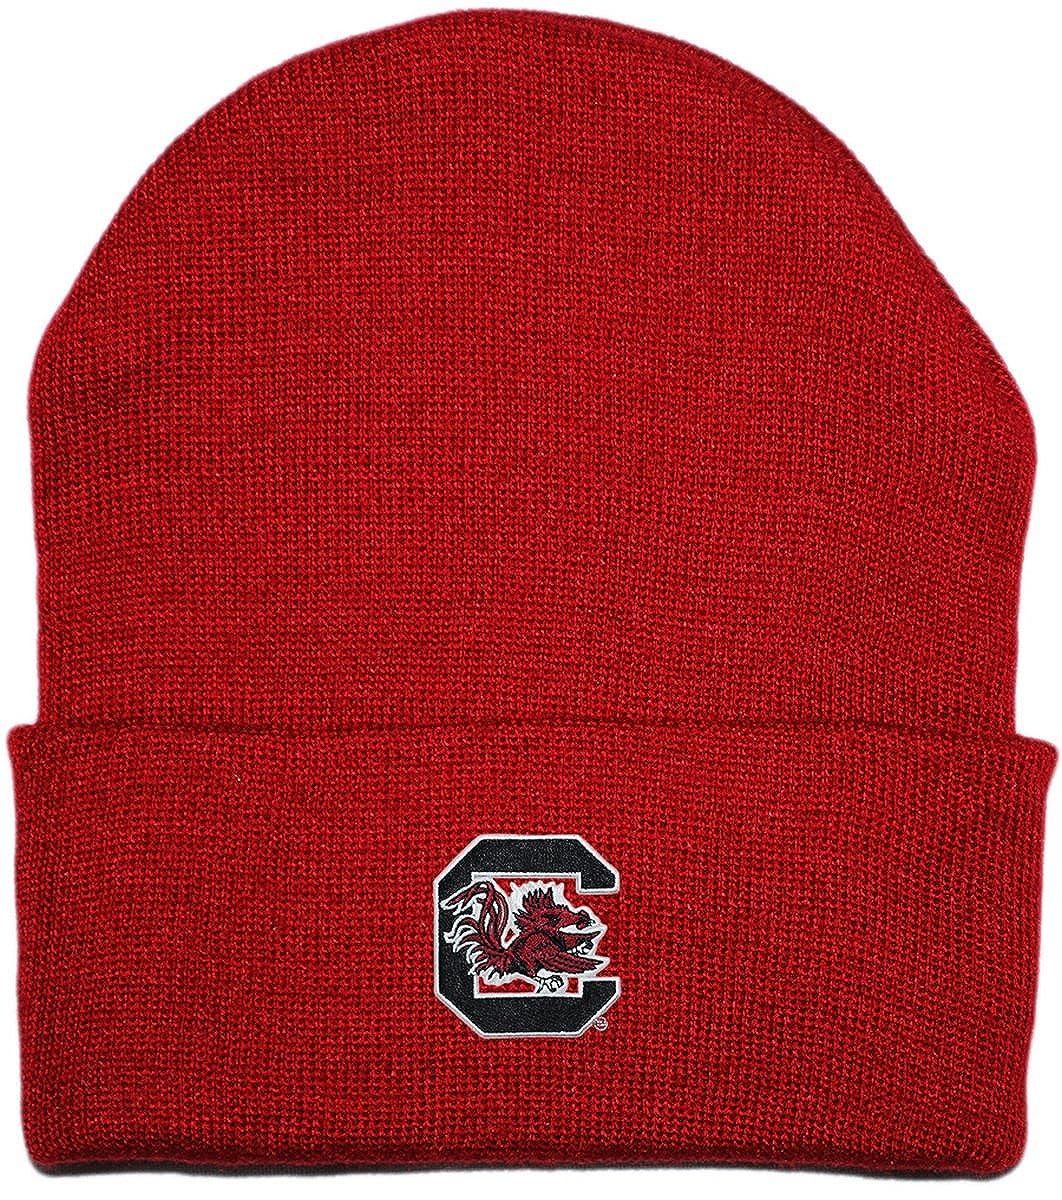 Creative Knitwear NCAA Southeastern Conference SEC Newborn Baby Knit Cap